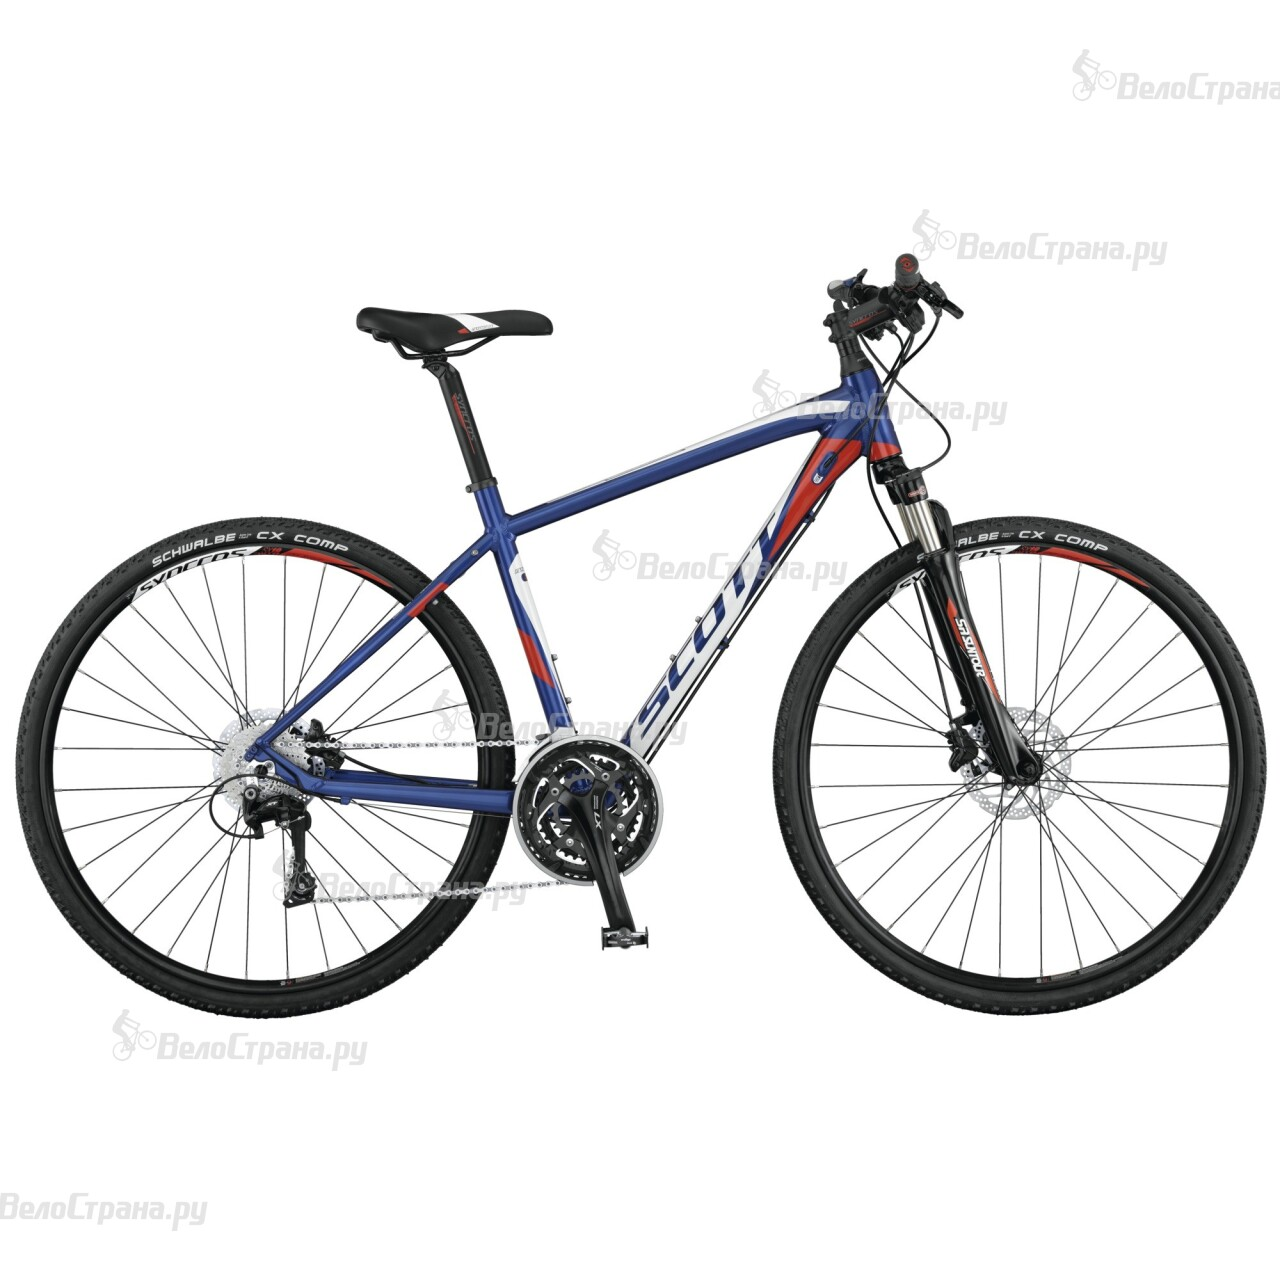 Велосипед Scott Sportster 10 (2015)